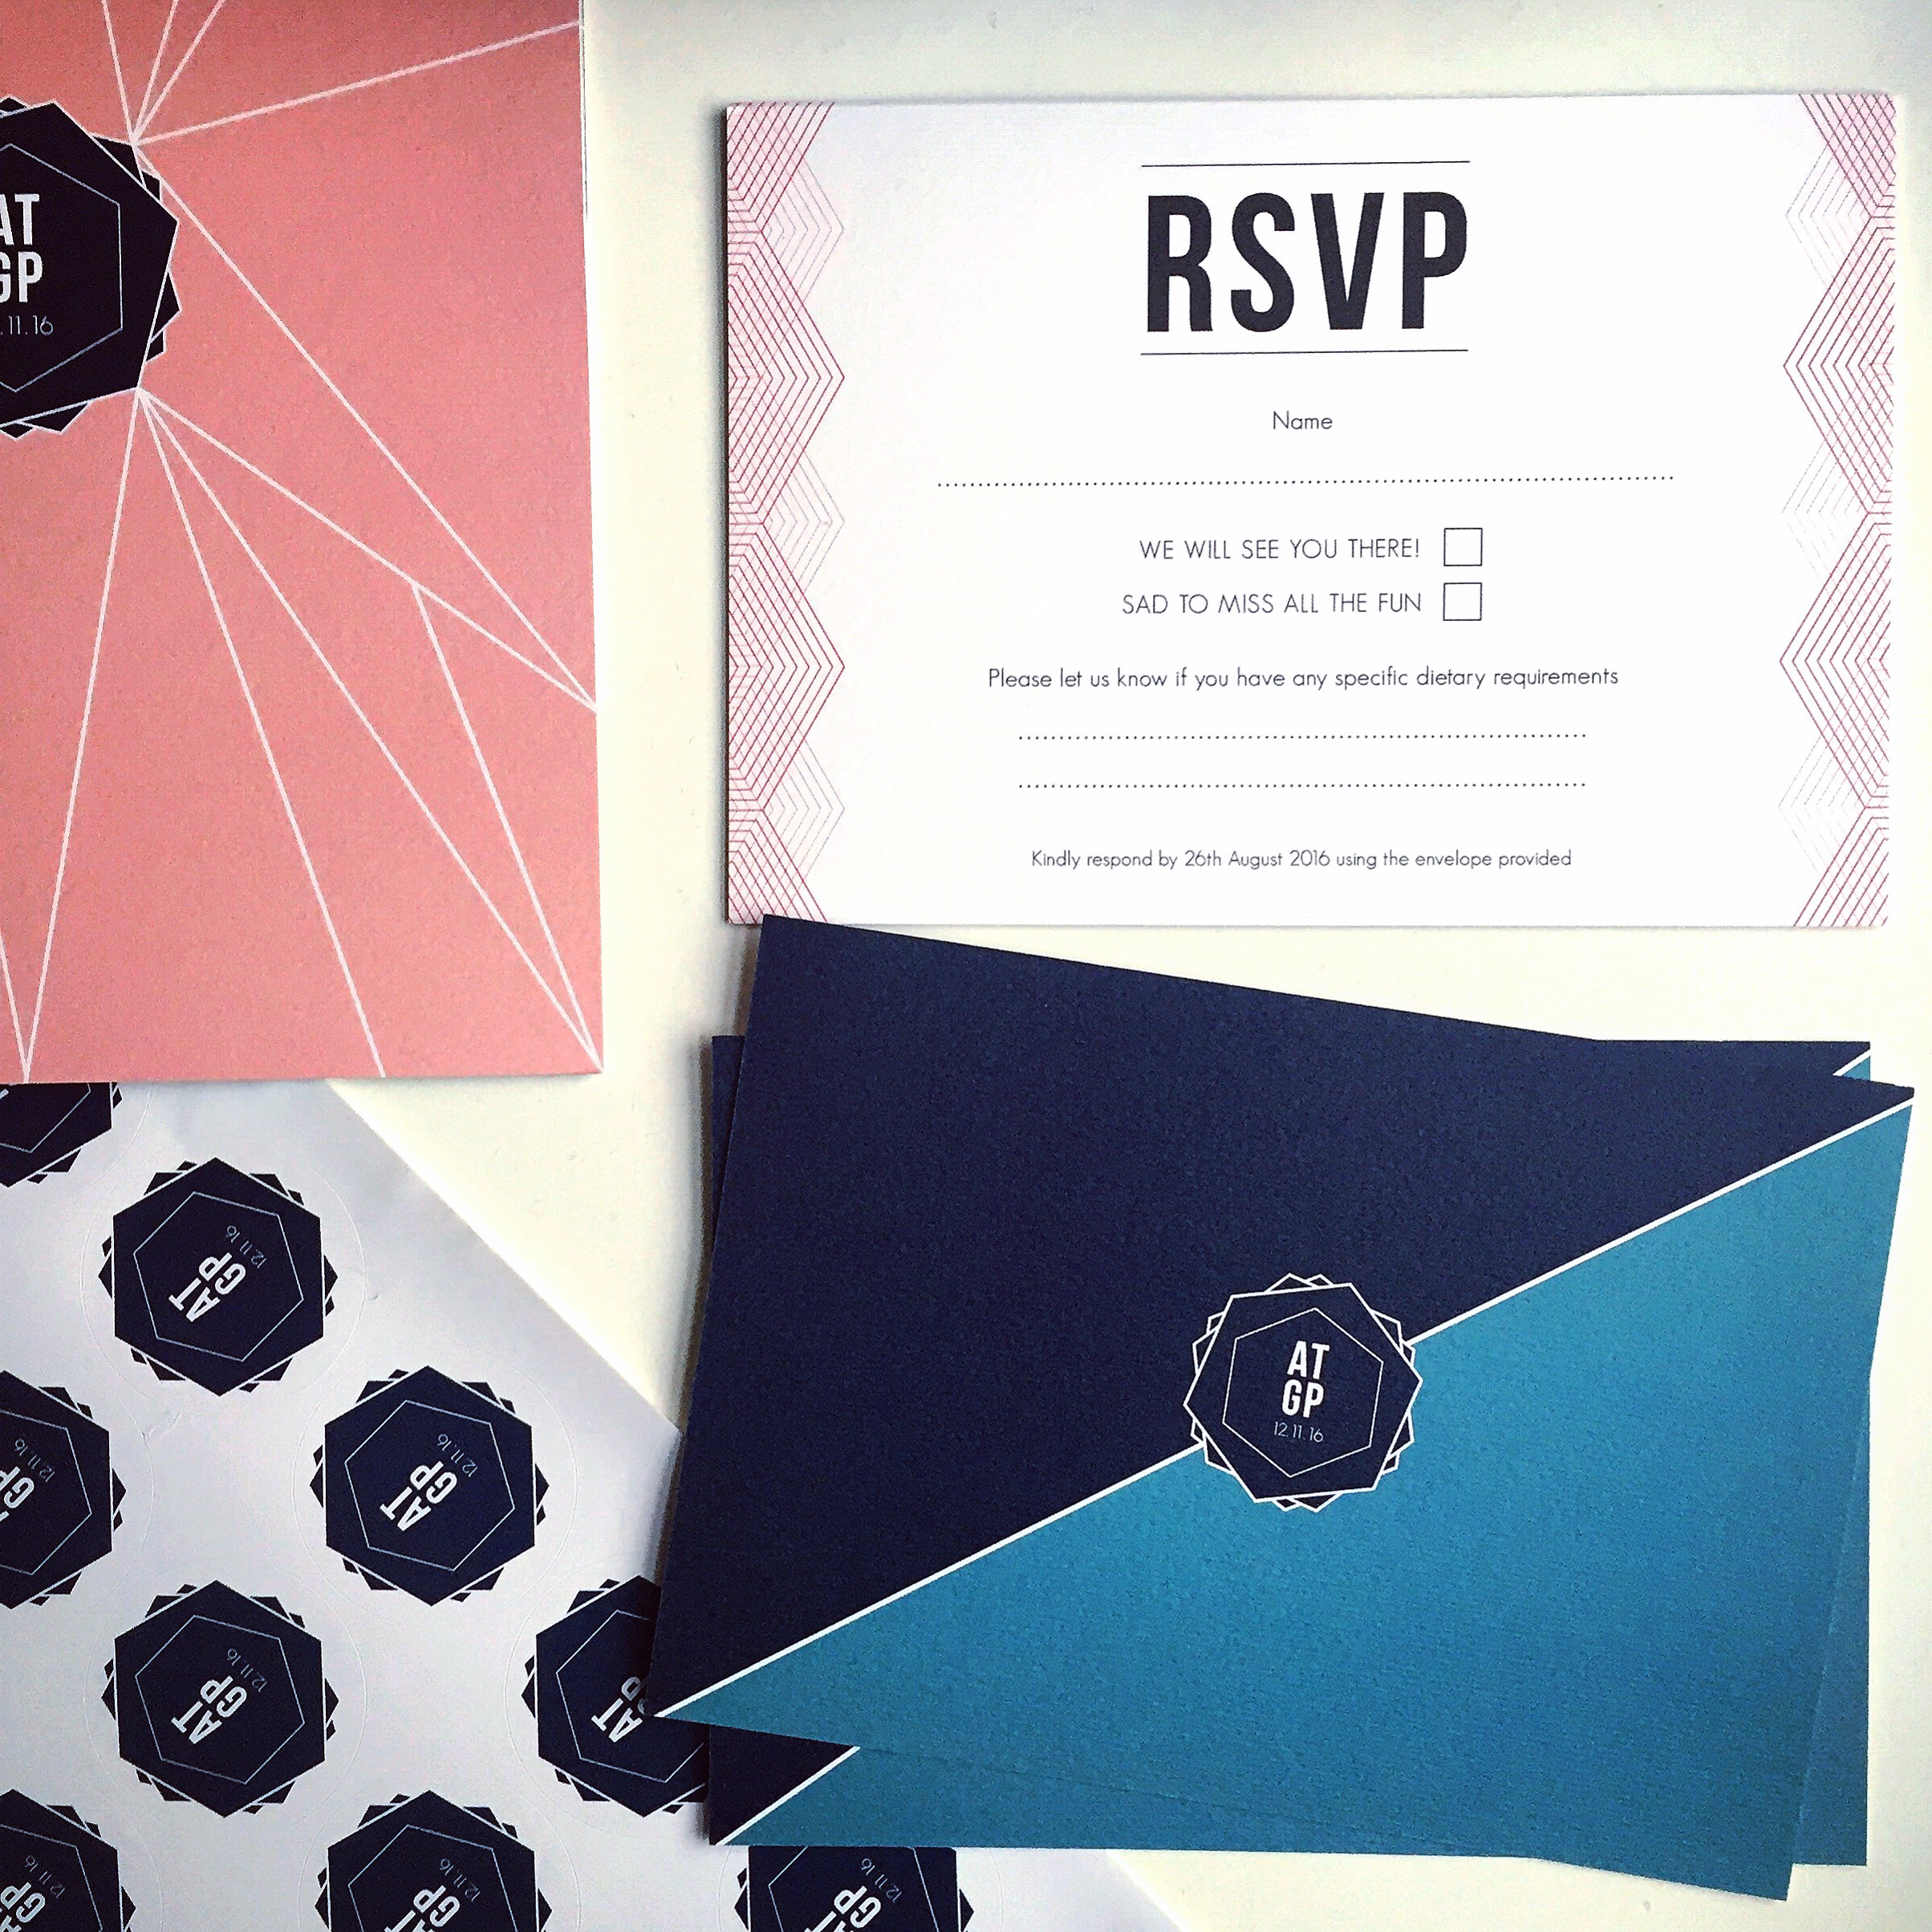 geometric-copper-invite-wedding-the-ink-closet-rsvp-2.JPG